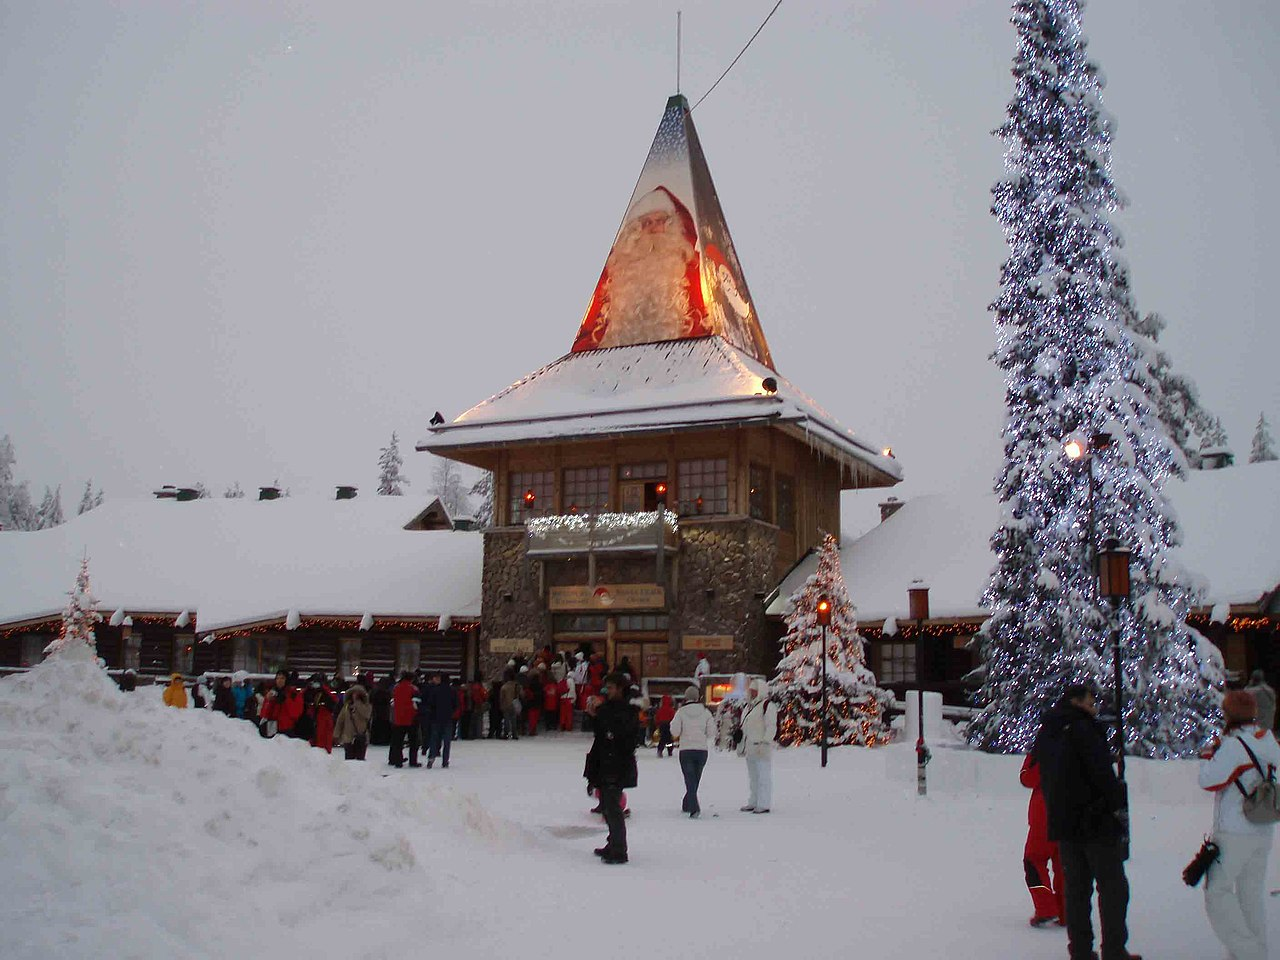 passeios na finlandia santa claus village